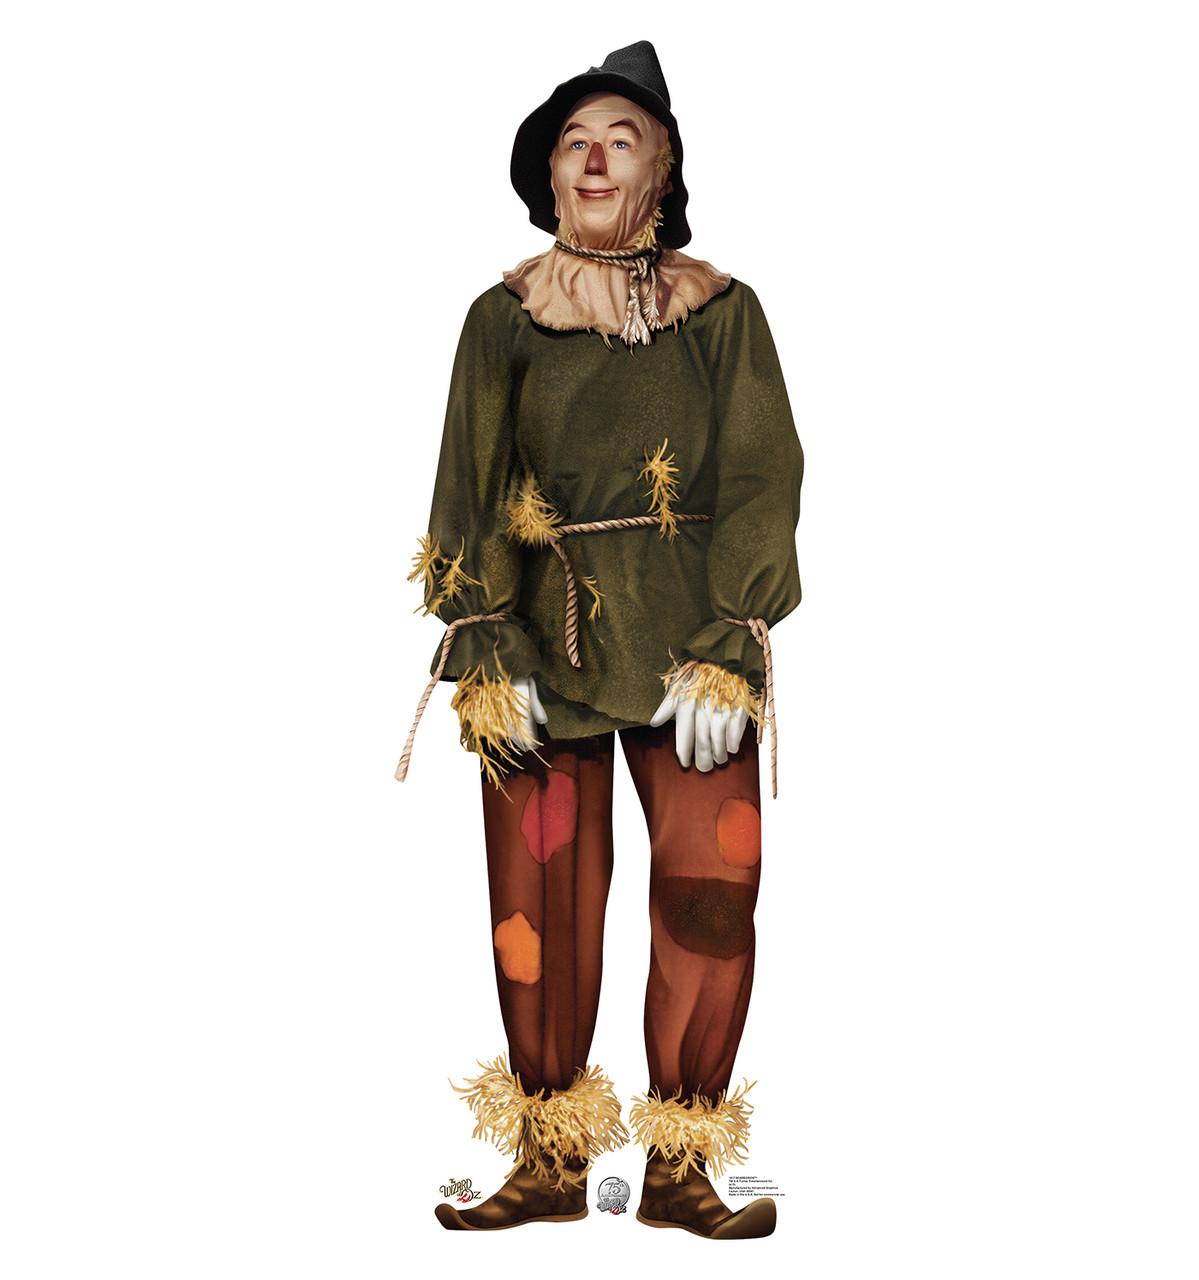 Life-size Scarecrow - Wizard of Oz Cardboard Standup